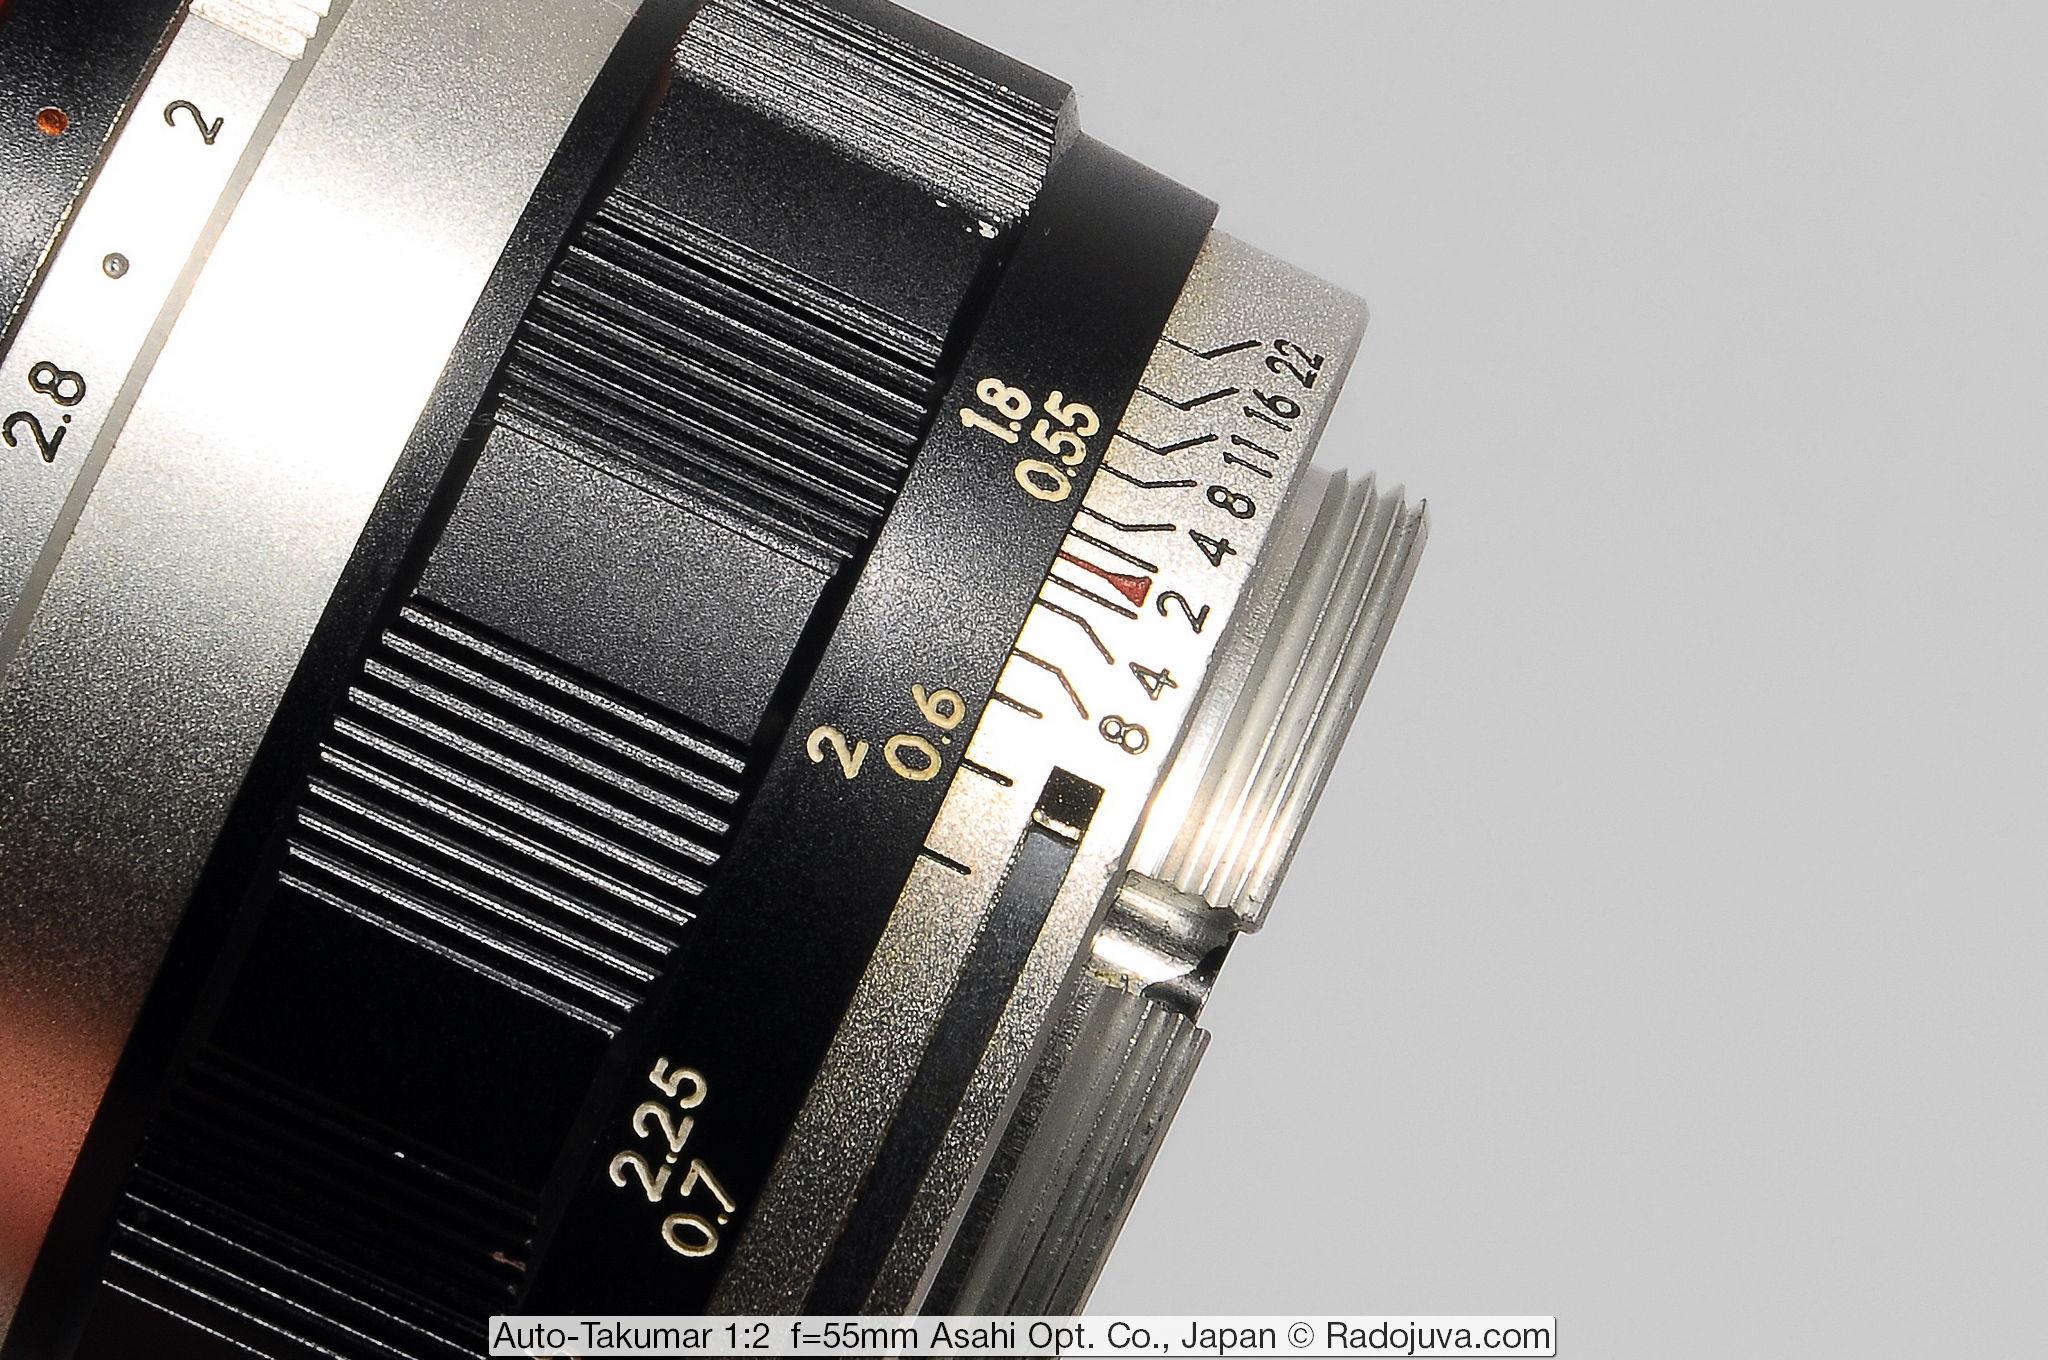 Auto-Takumar 1:2 f=55mm Asahi Opt. Co., Japan